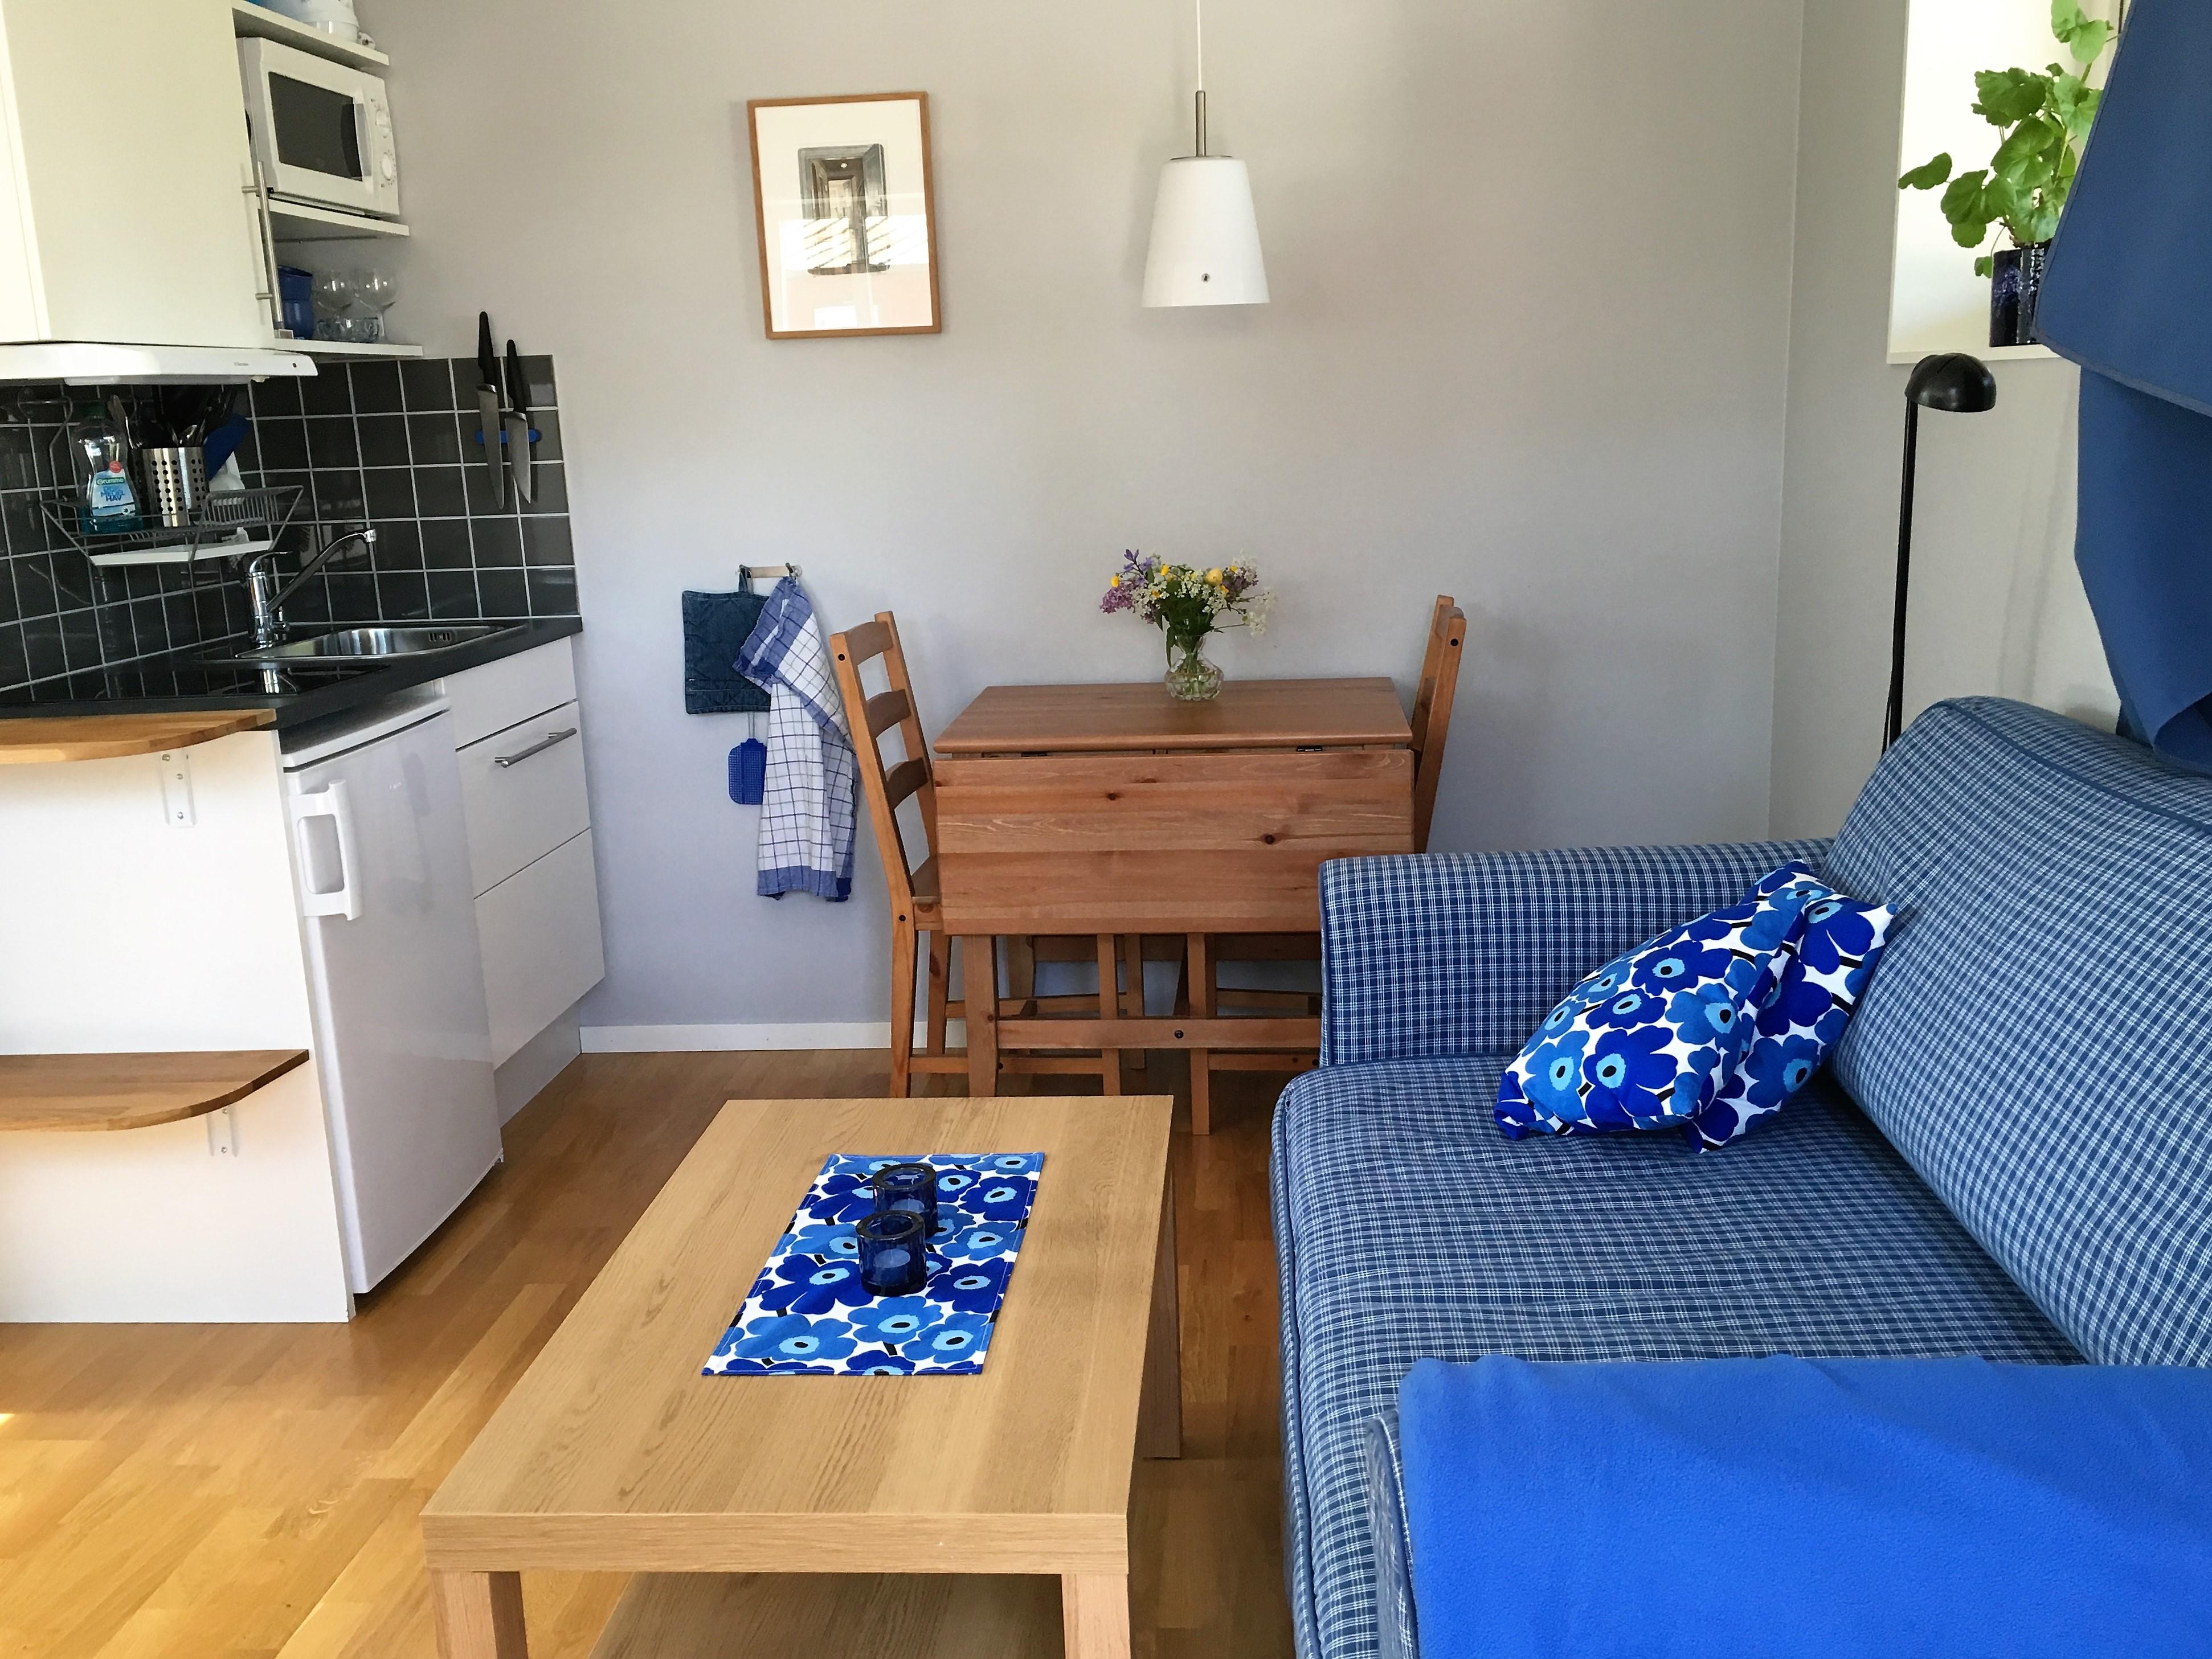 Boende Gotland - Ljungs fem rum